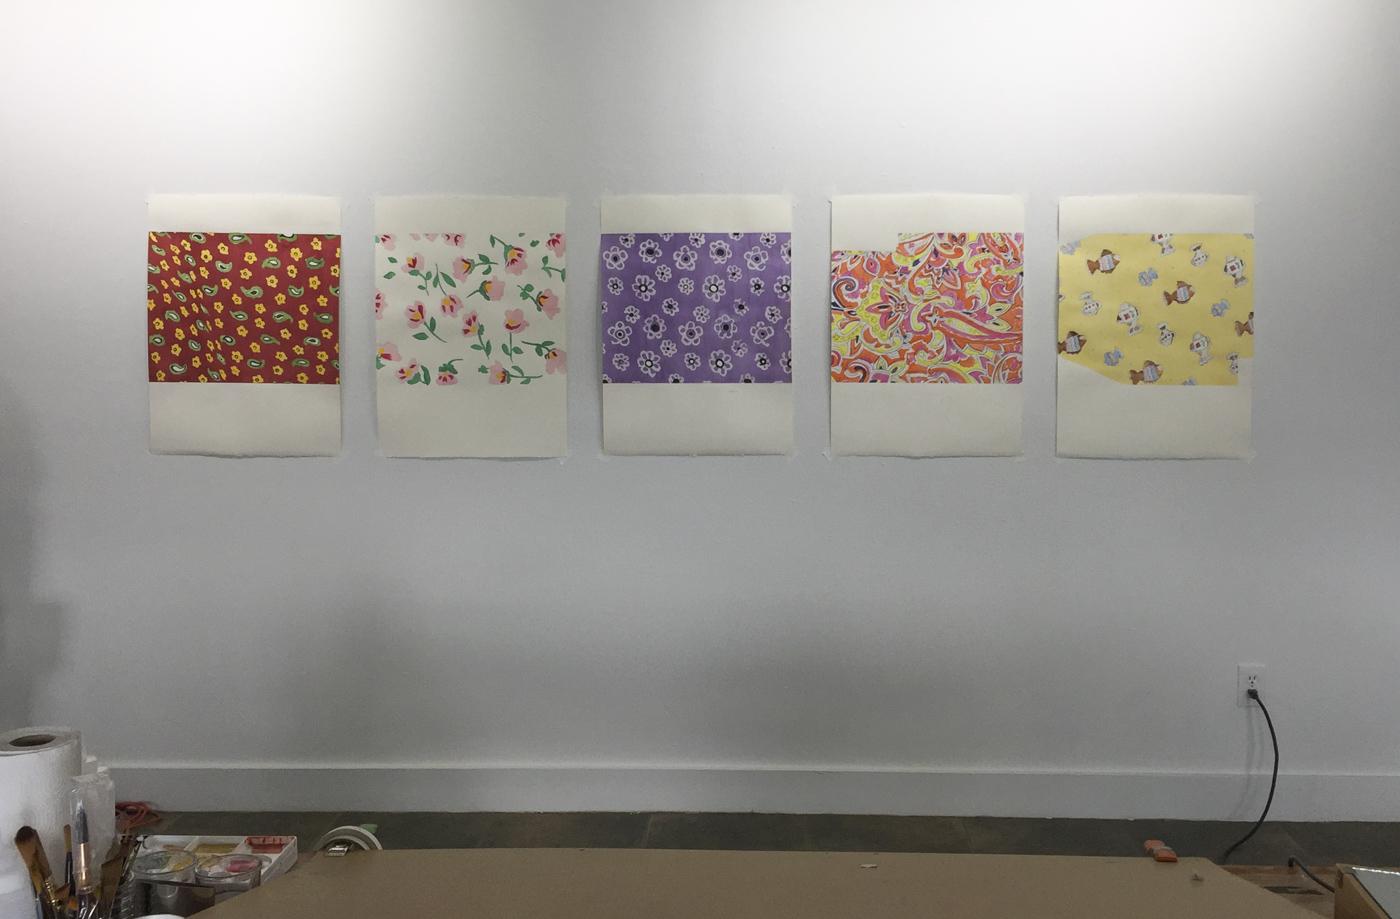 Cindy Bernard, Vinland, Work in progress, UCross Residency, 2017